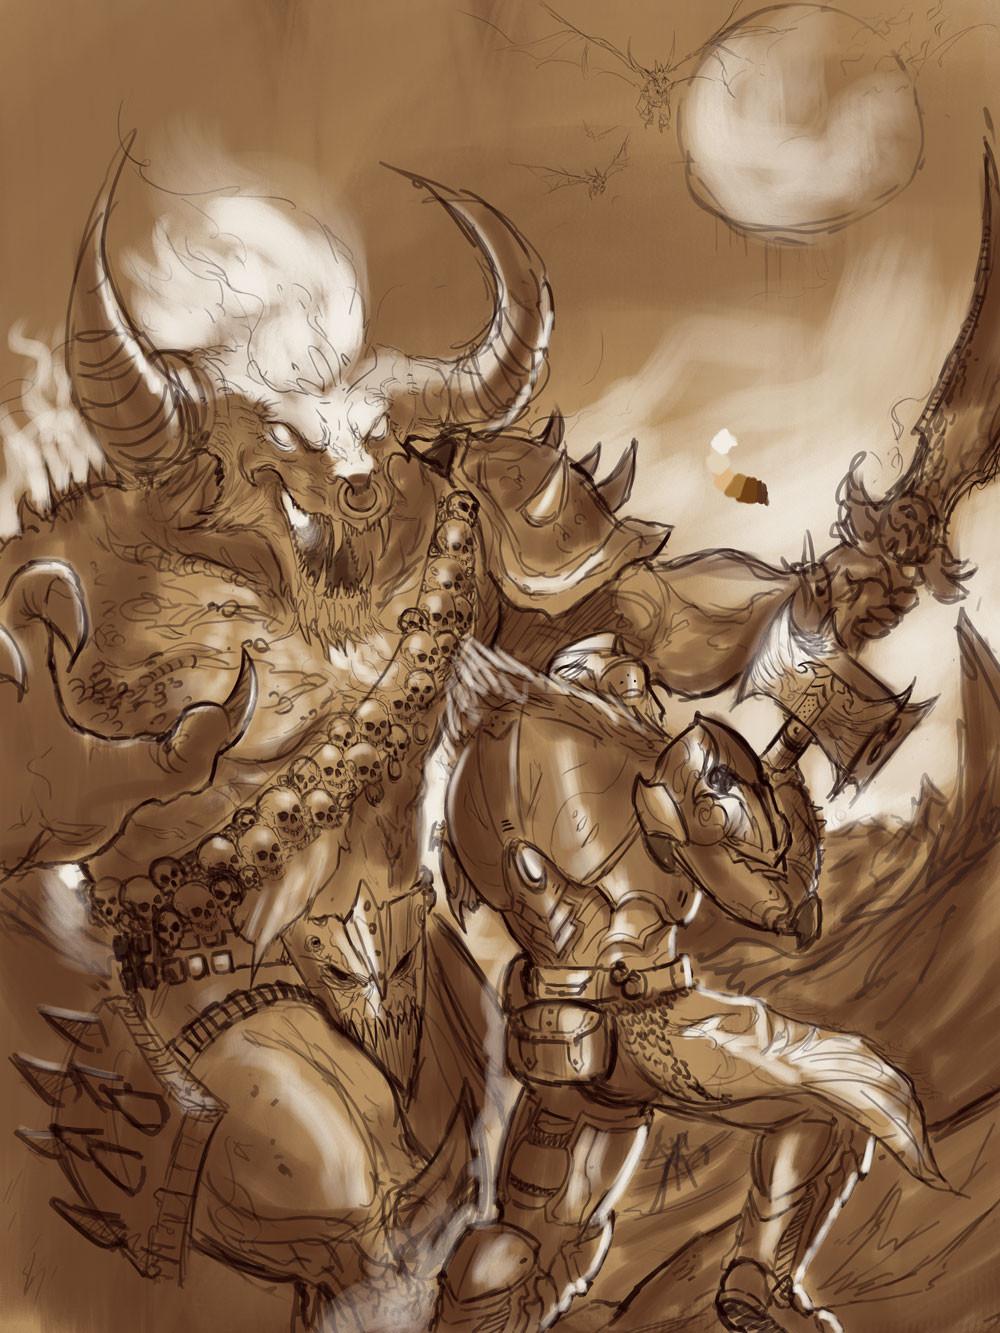 Michael rookard alexandros v blackmetallord wip2